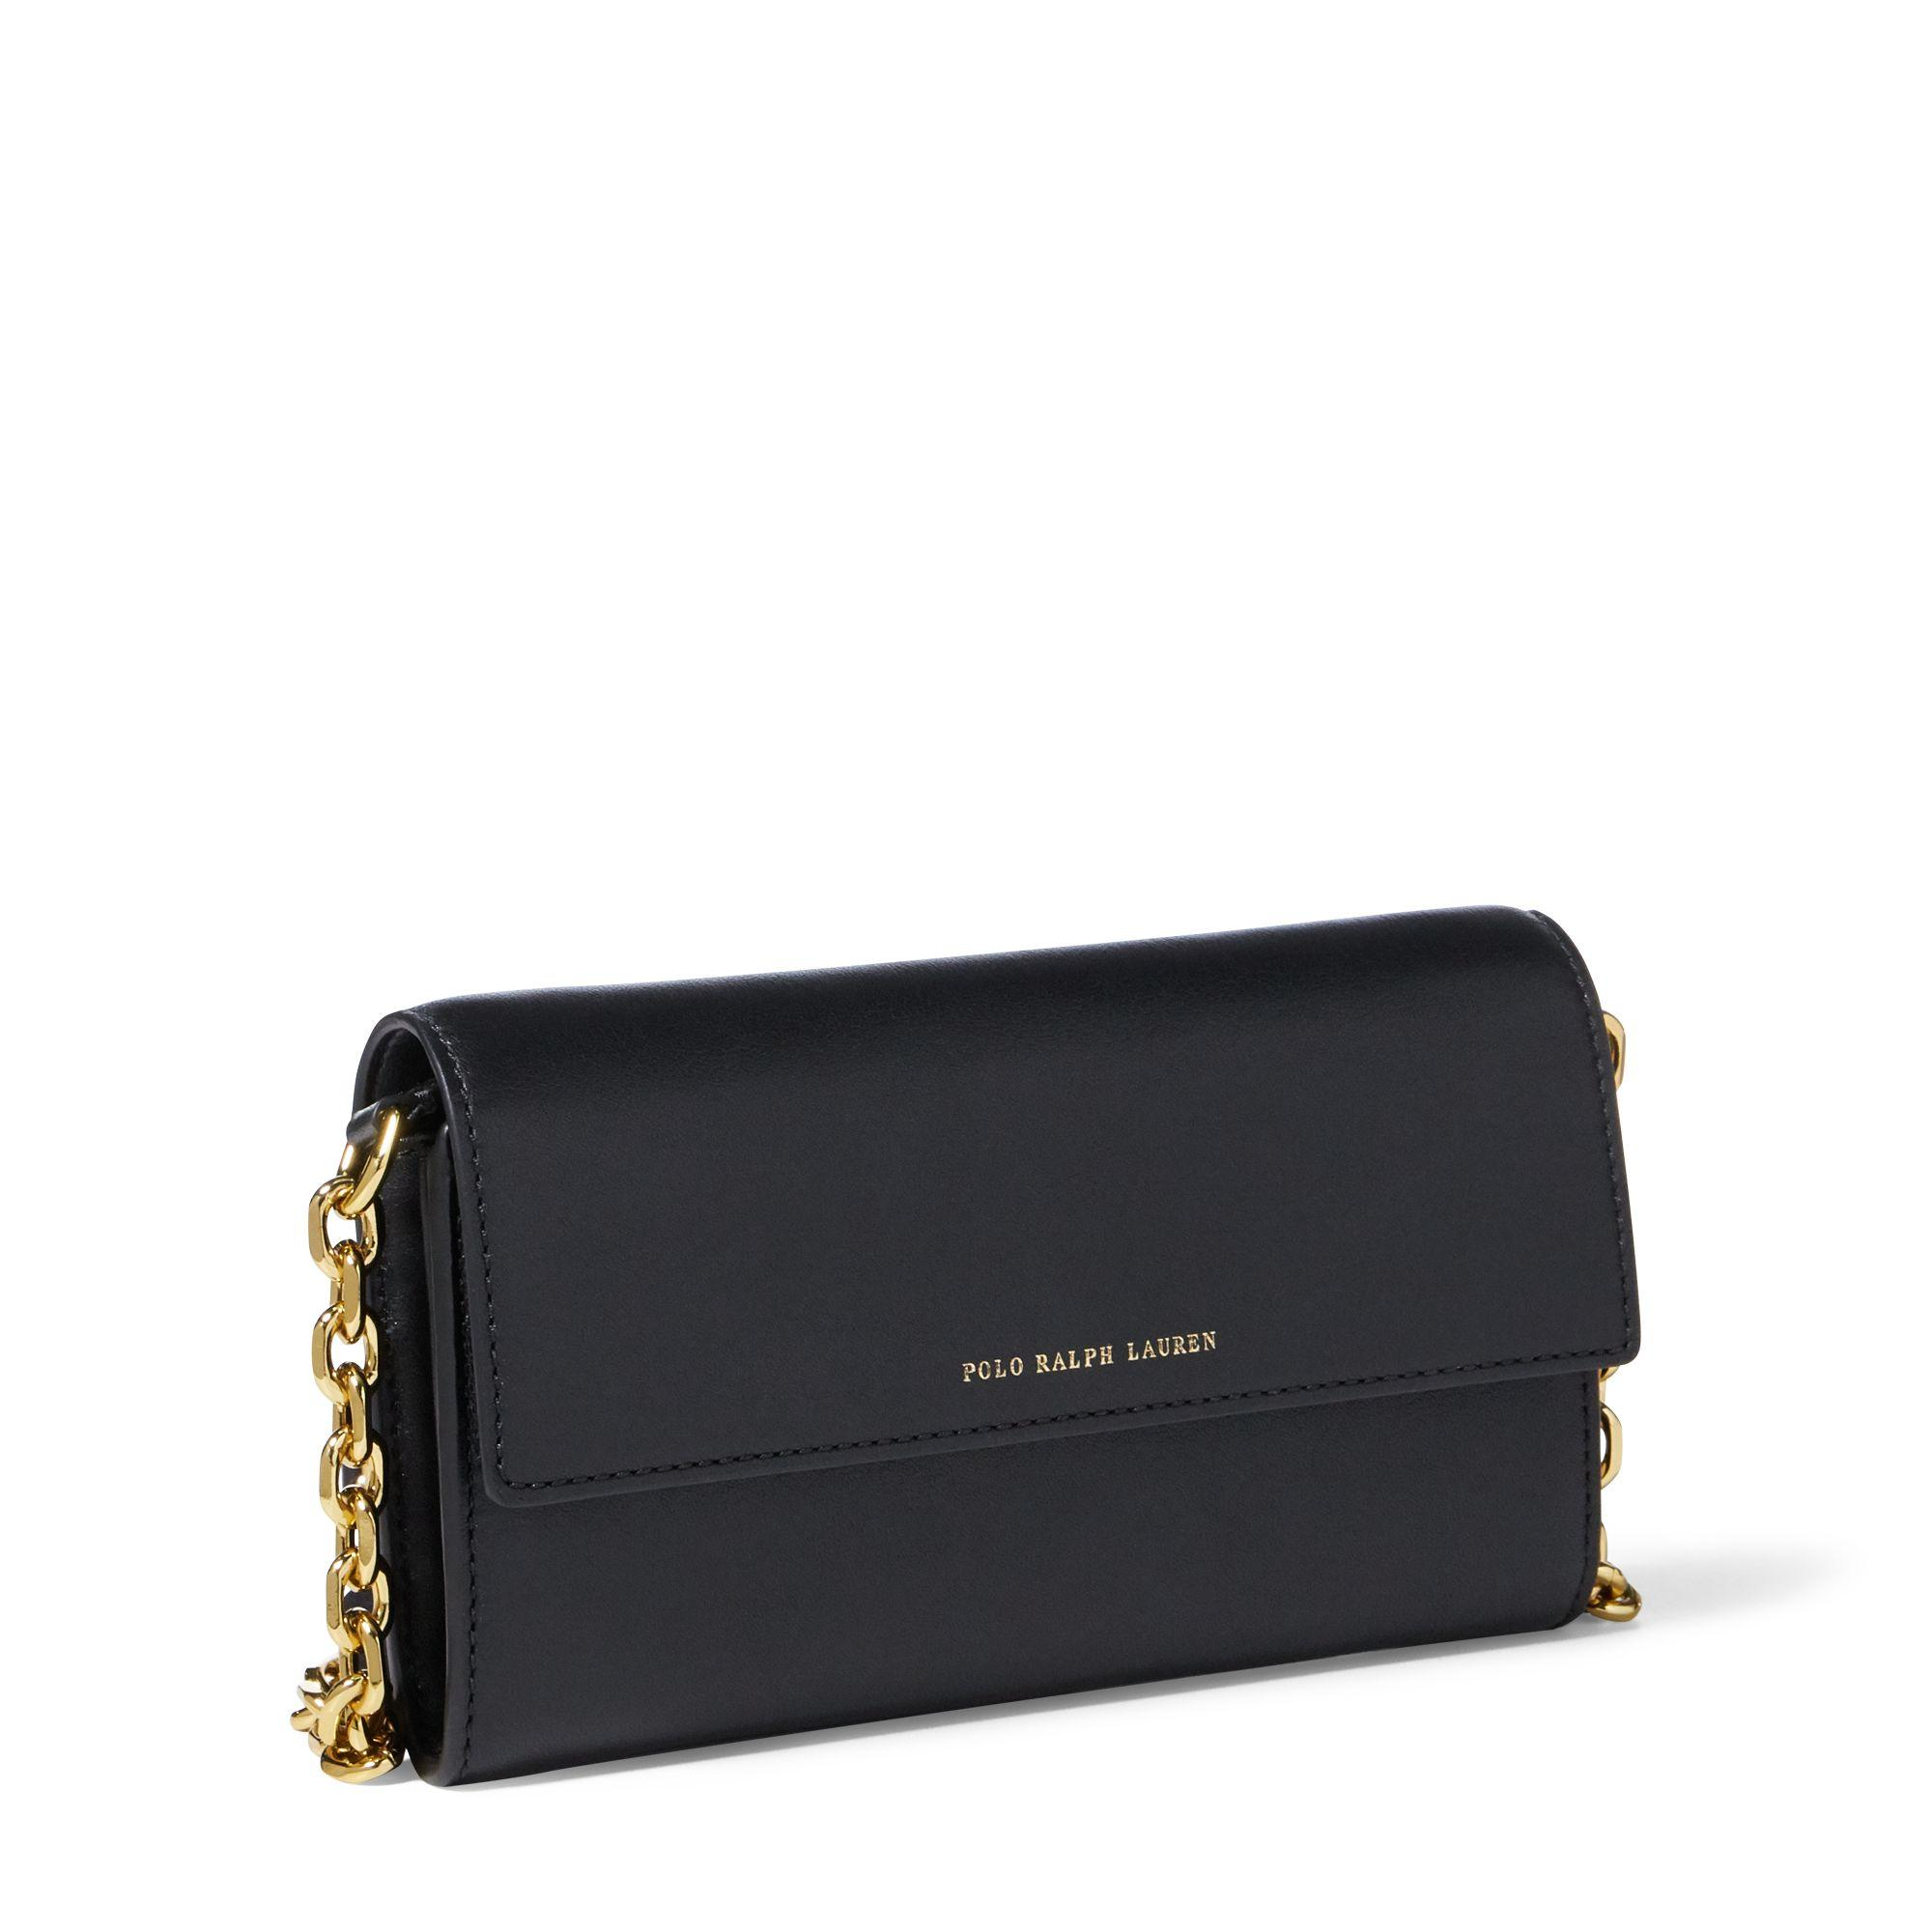 28feb820dc Lyst - Polo Ralph Lauren Nappa Leather Chain Wallet in Black